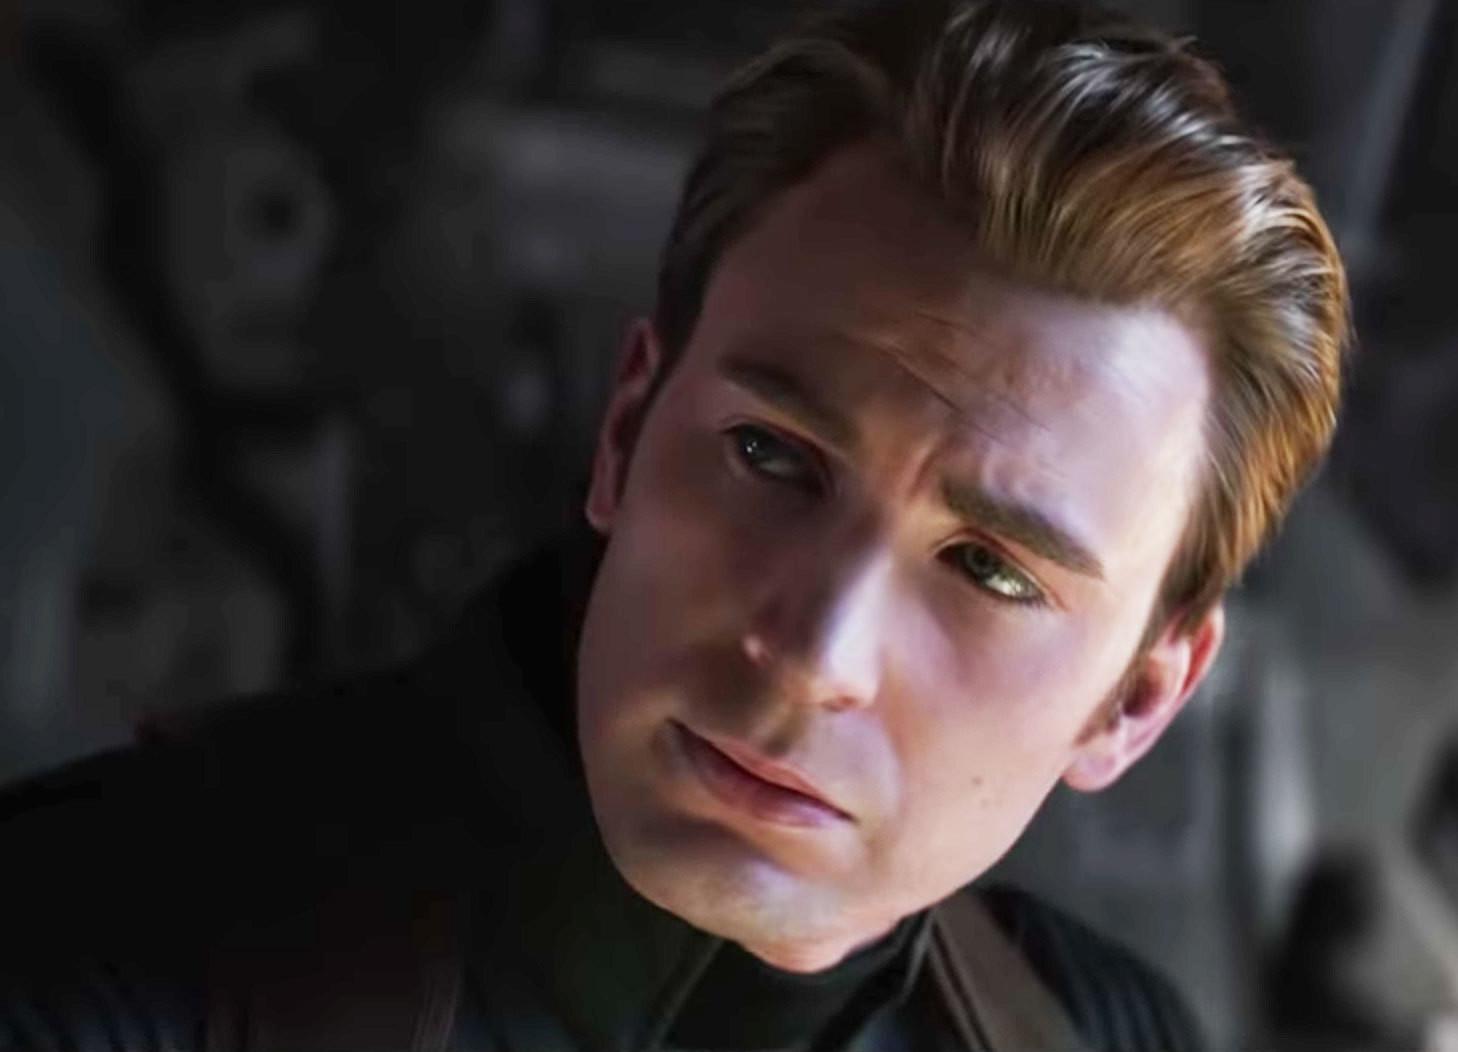 The 'Avengers: Endgame' Trailer Just Broke A Major Record